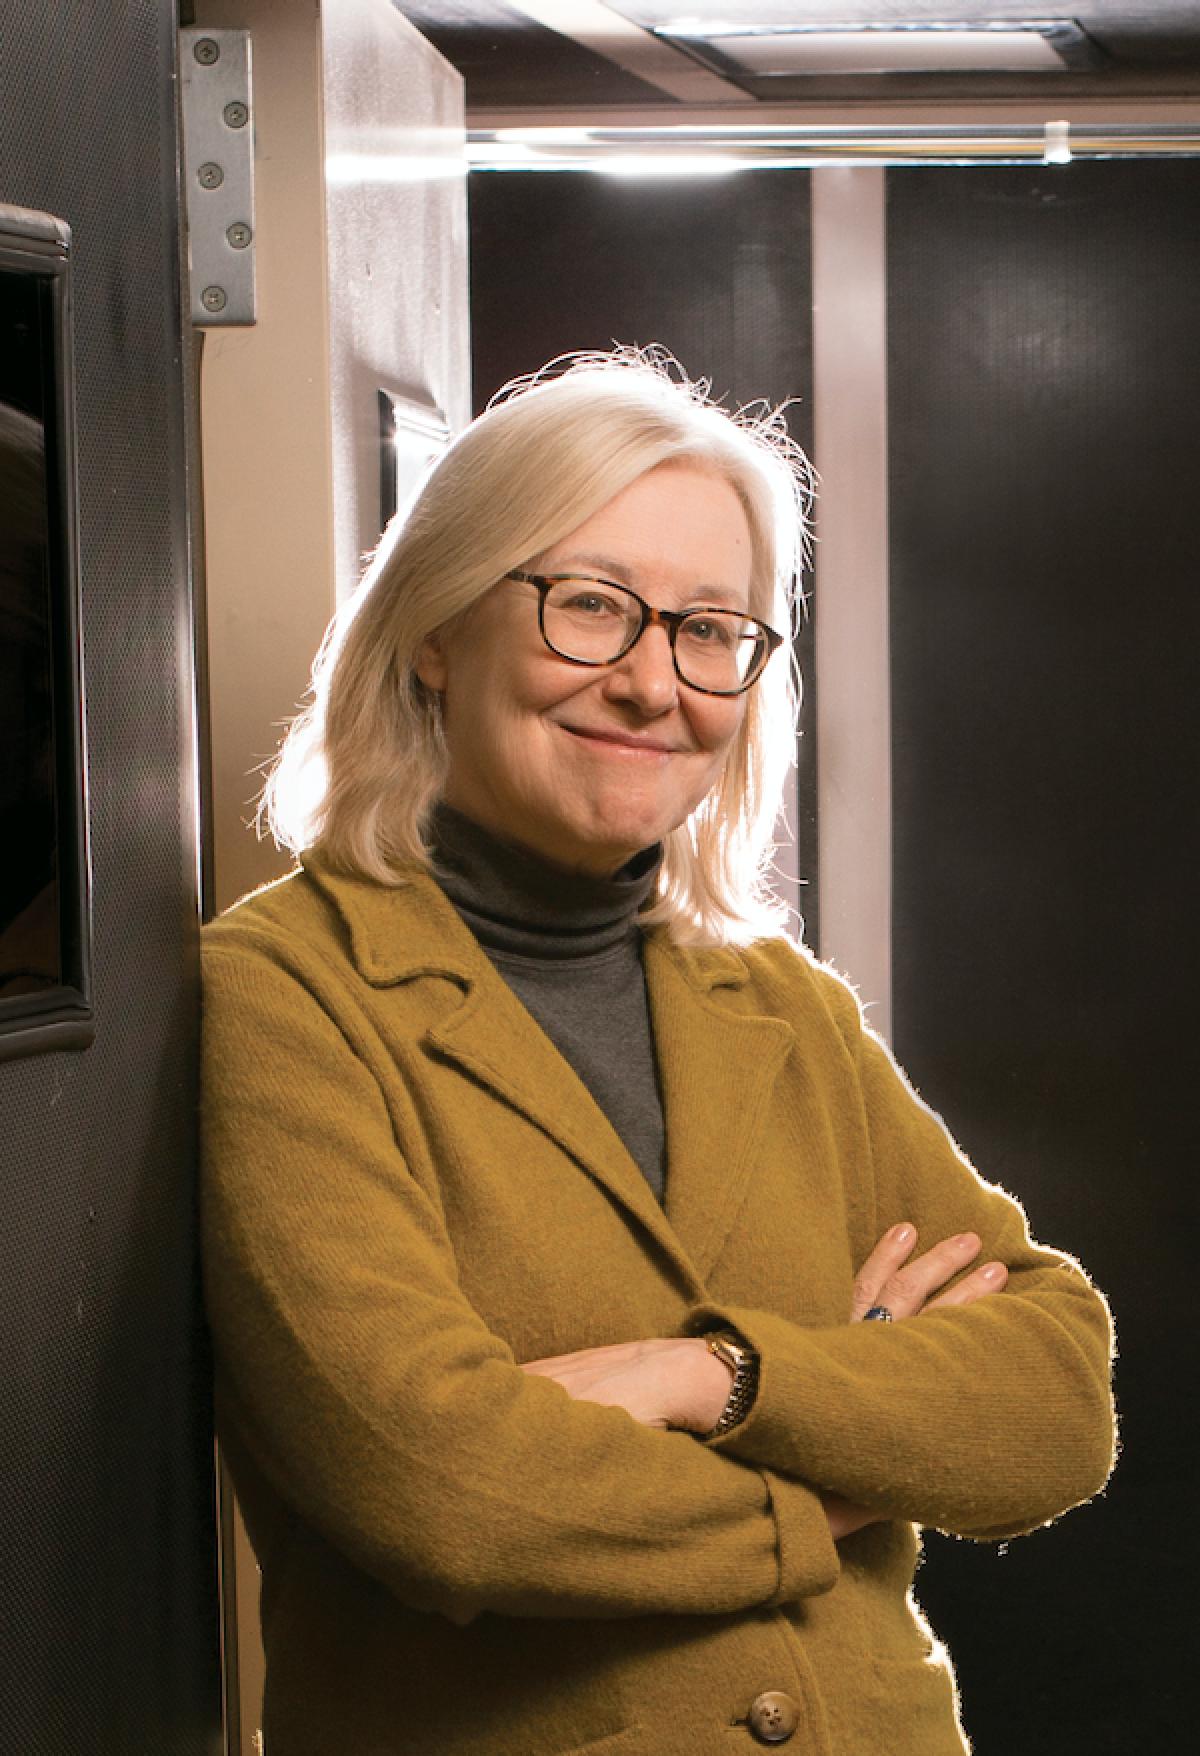 Amazon Scholar Julia Hirschberg